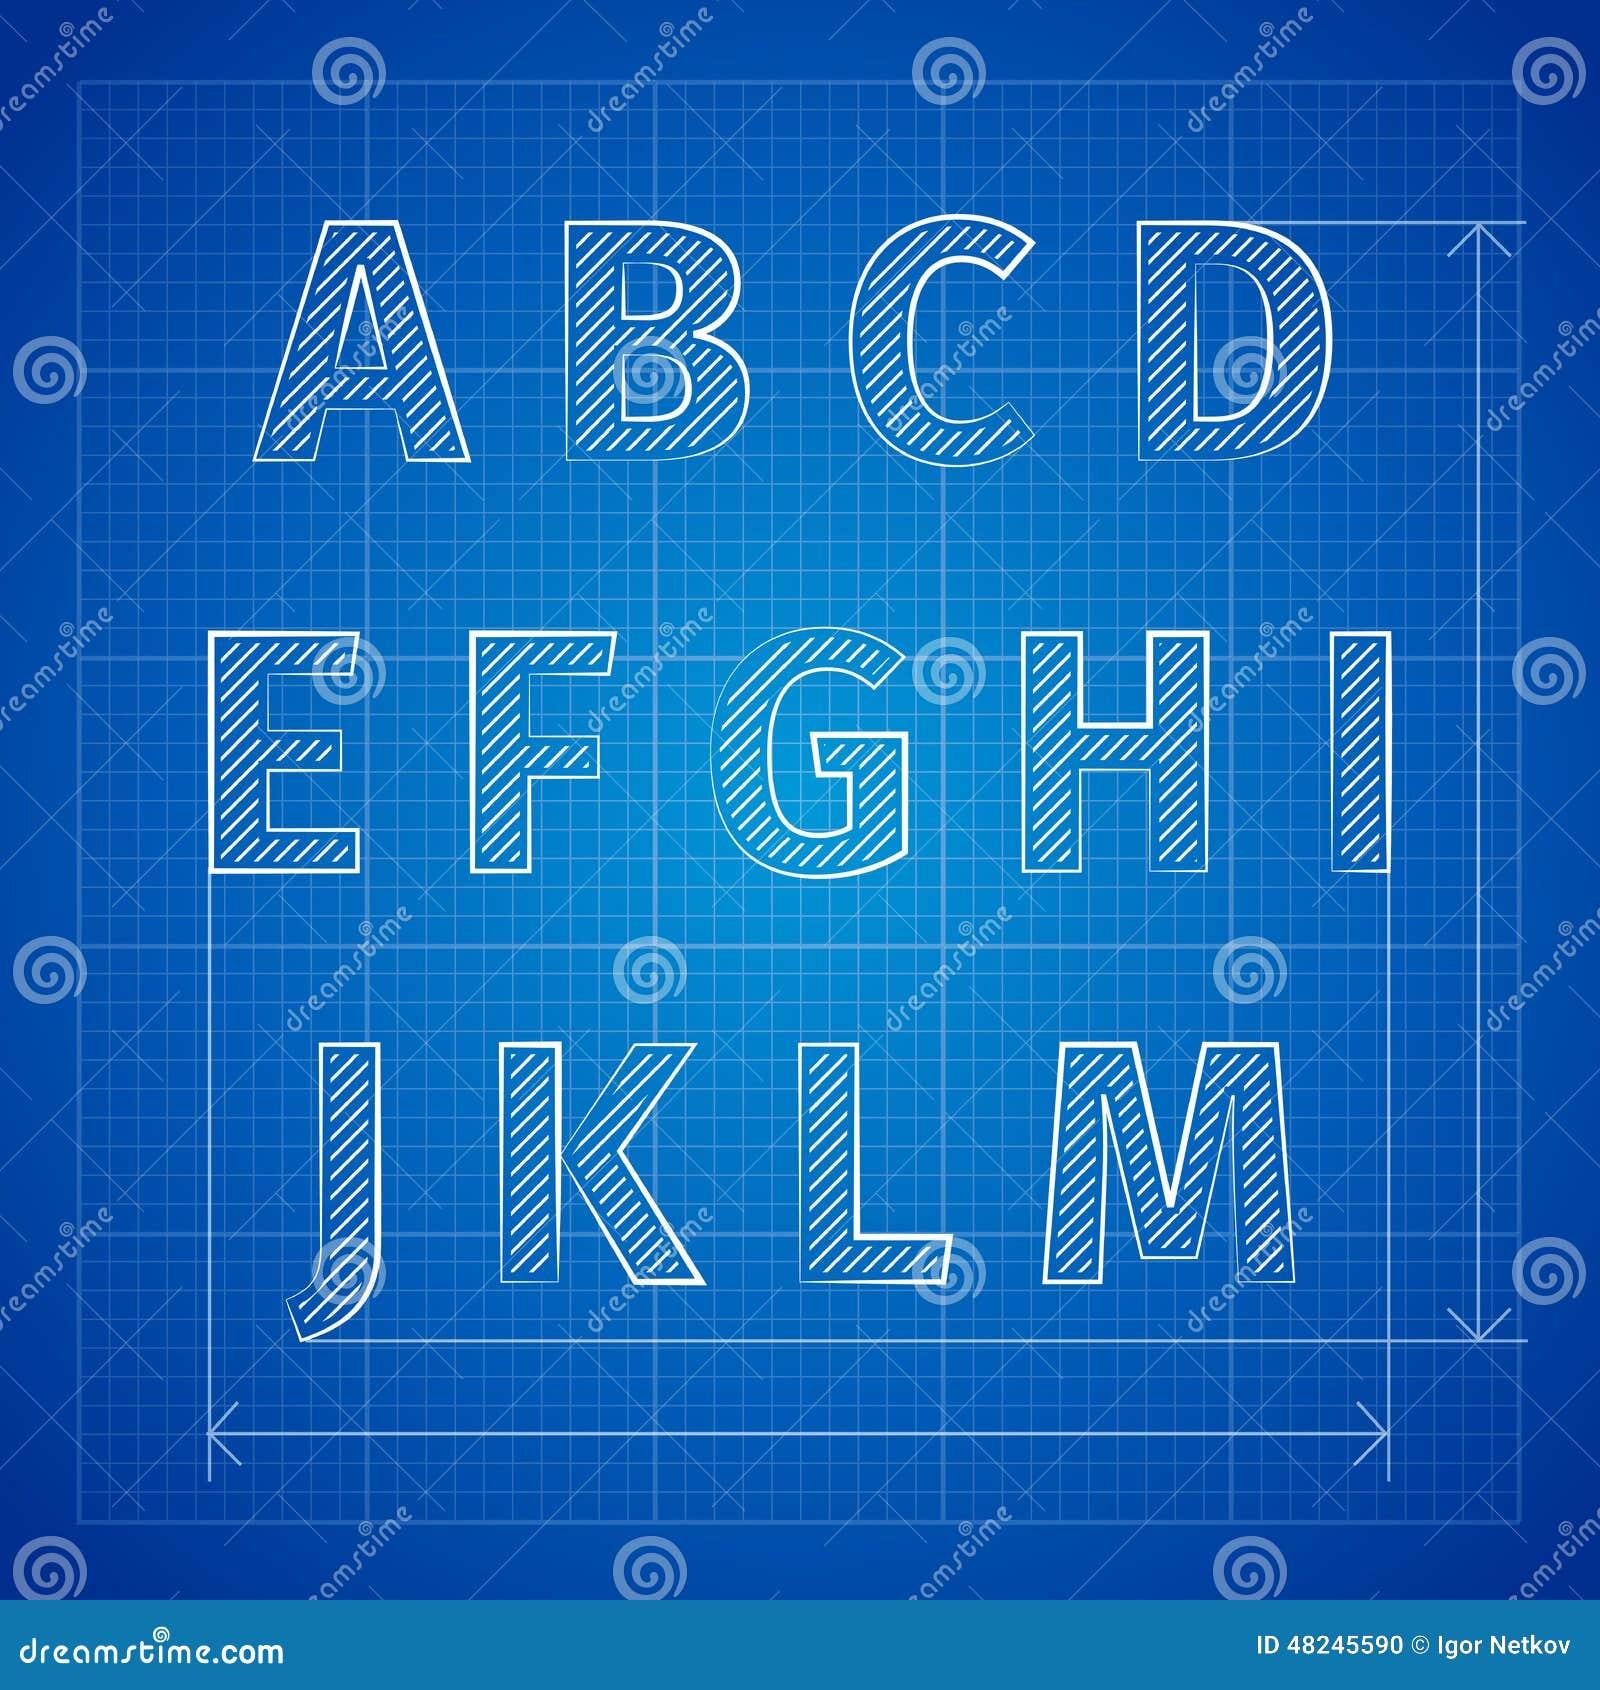 Blueprint template free free seamless blueprint pattern psd blueprint font stock vector image 48245590 malvernweather Choice Image